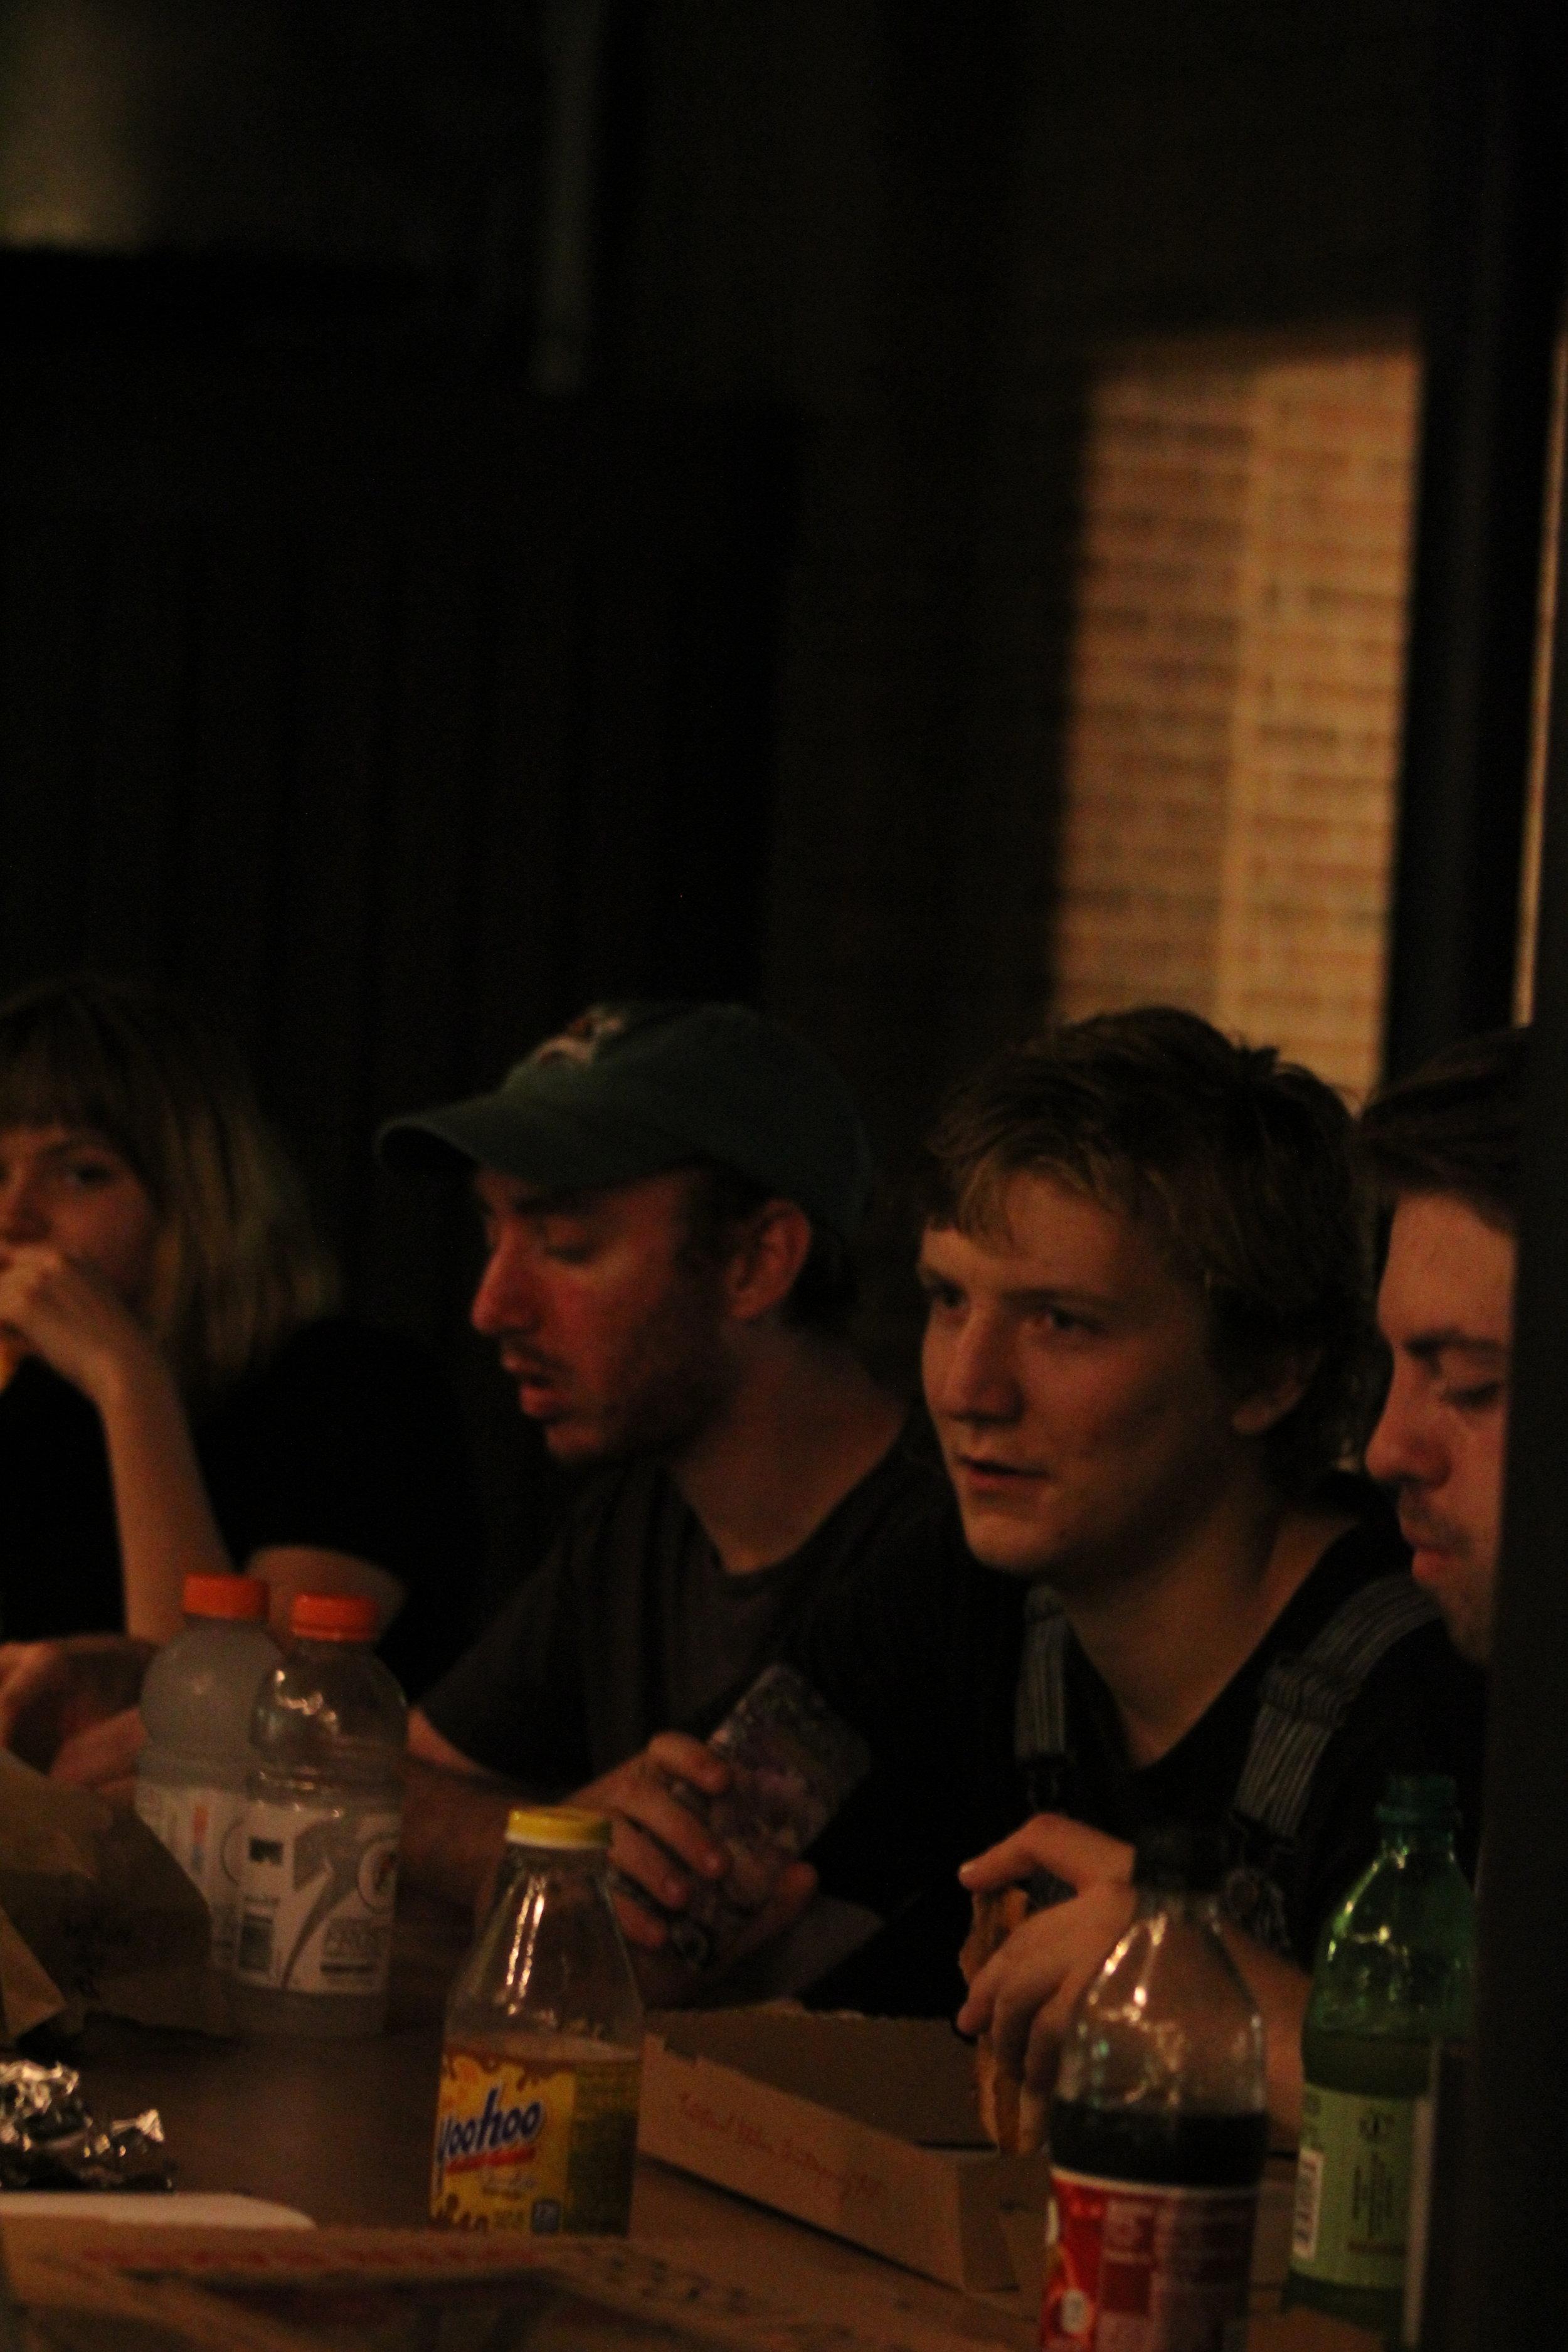 Molly Druga, Dan Fetterolf, Jackson Wise, and Timothy McFall